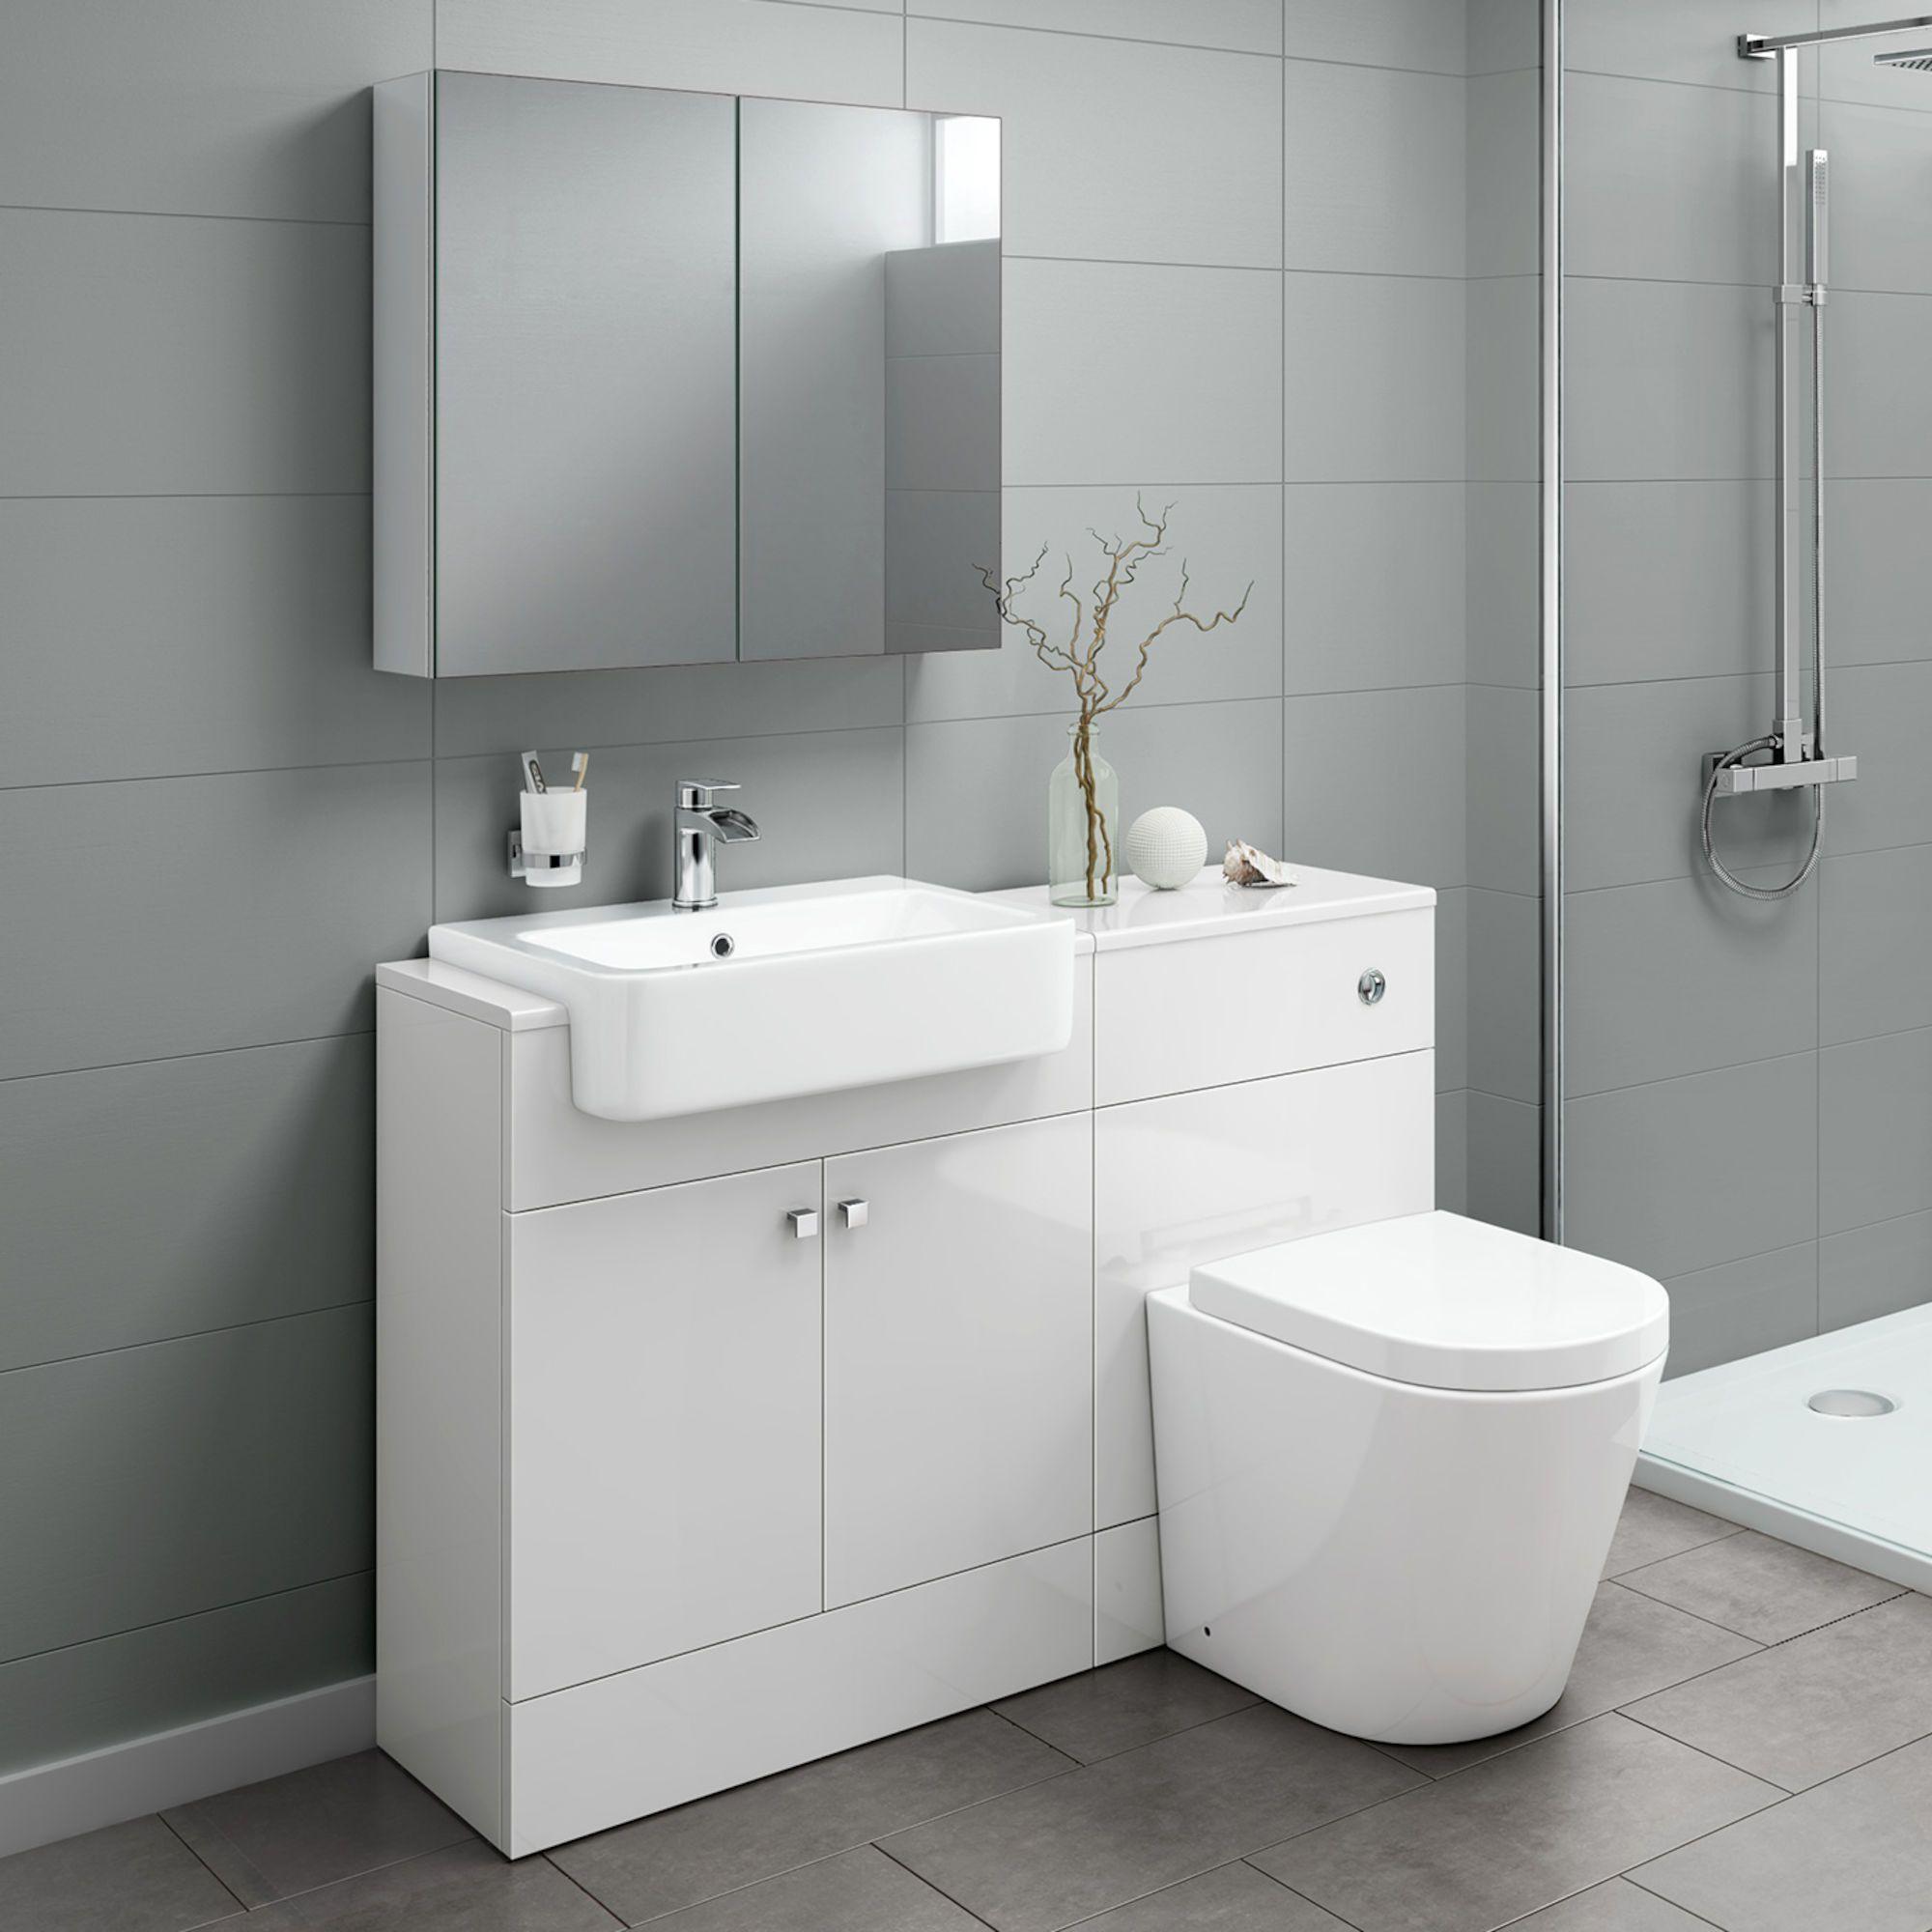 White Vanity Unit With Toilet